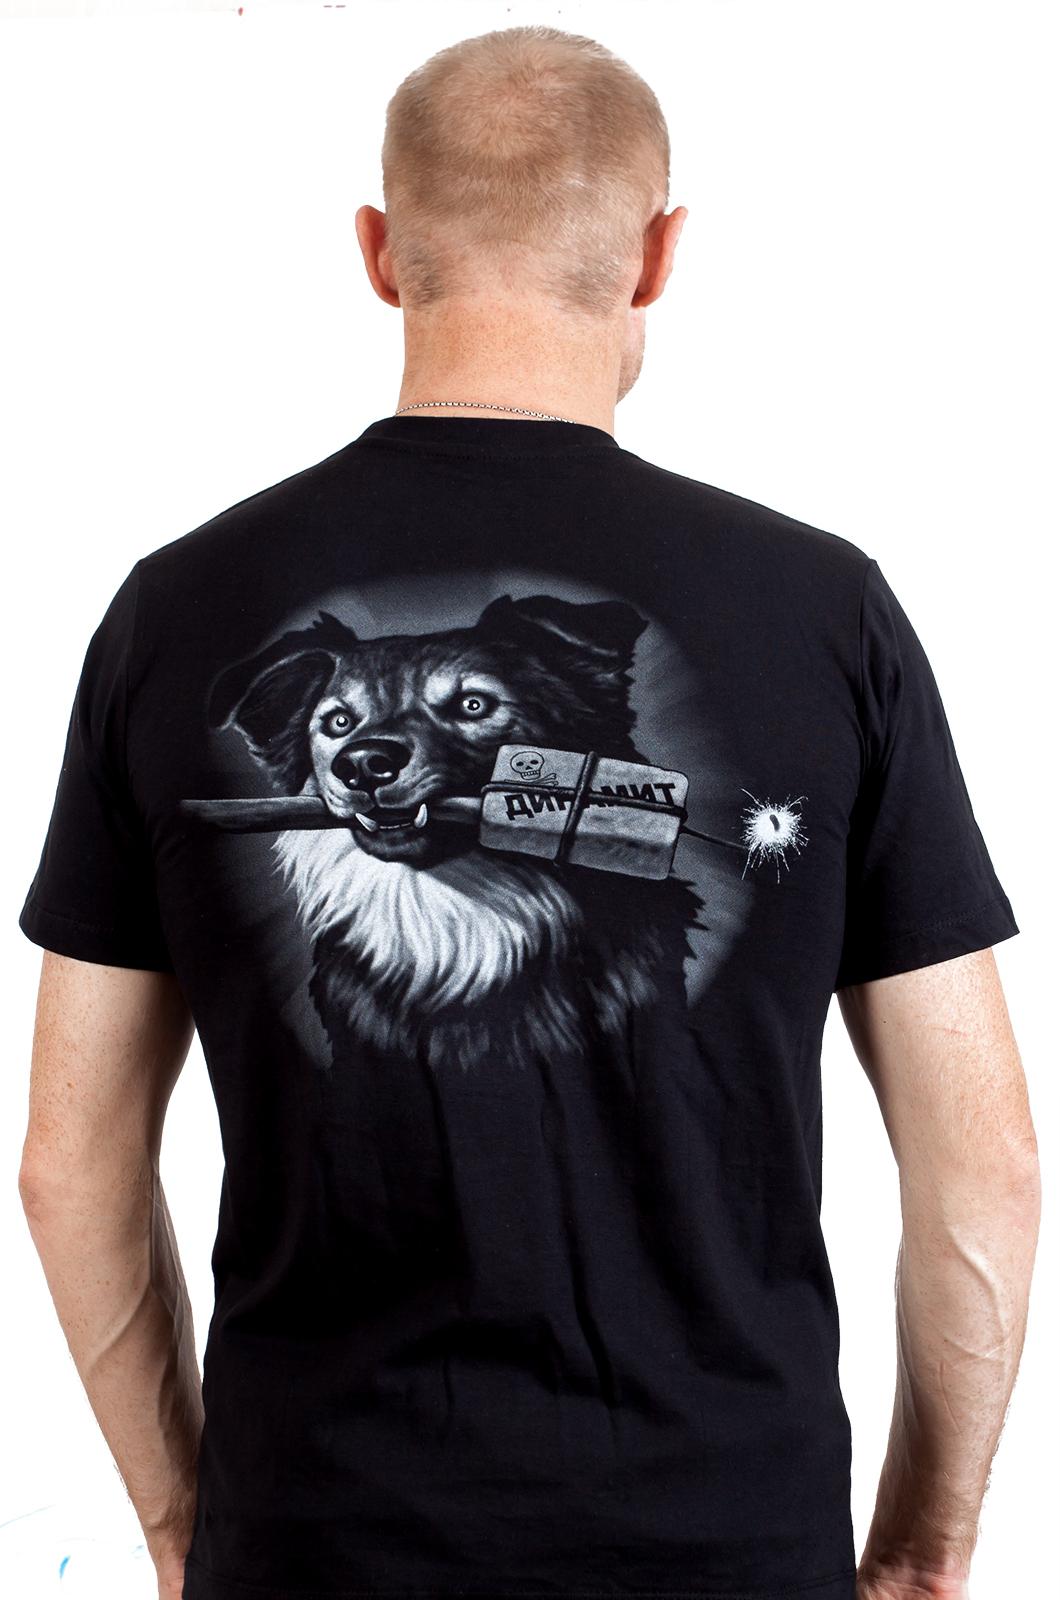 Прикольная футболка рыбаку